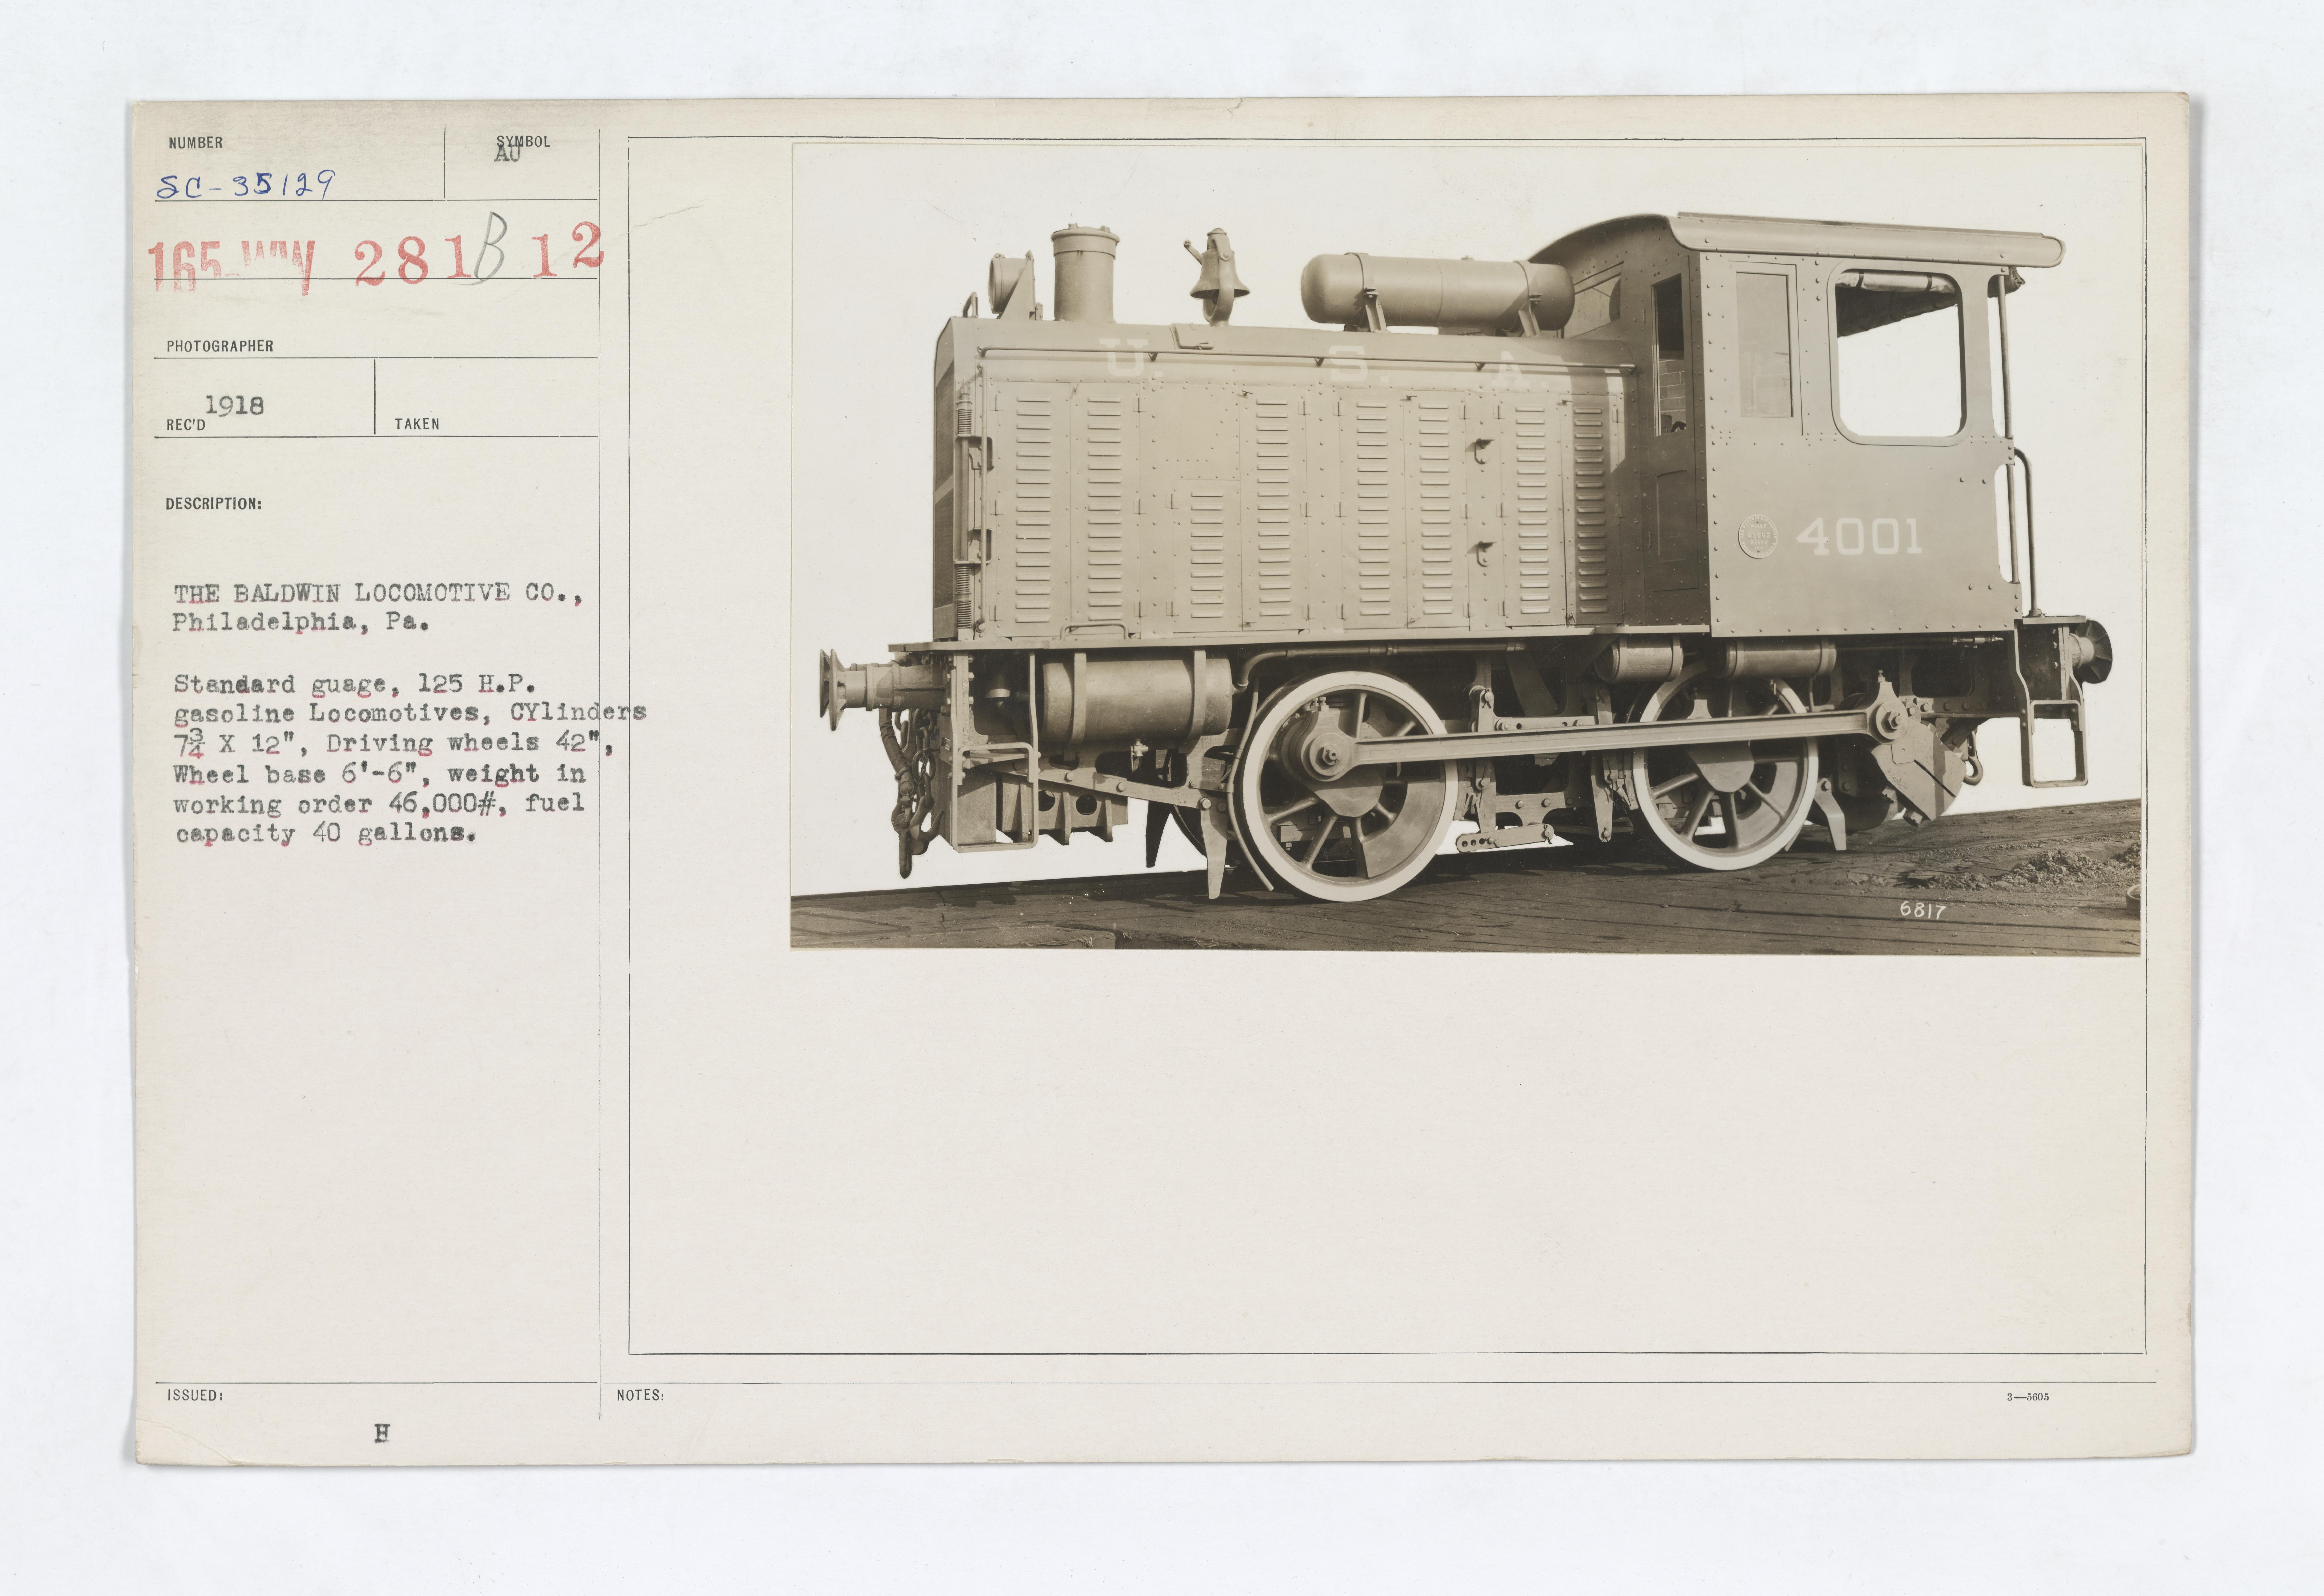 Military Administration - Transportation - Rail - THE BALDWIN LOCOMOTIVE CO